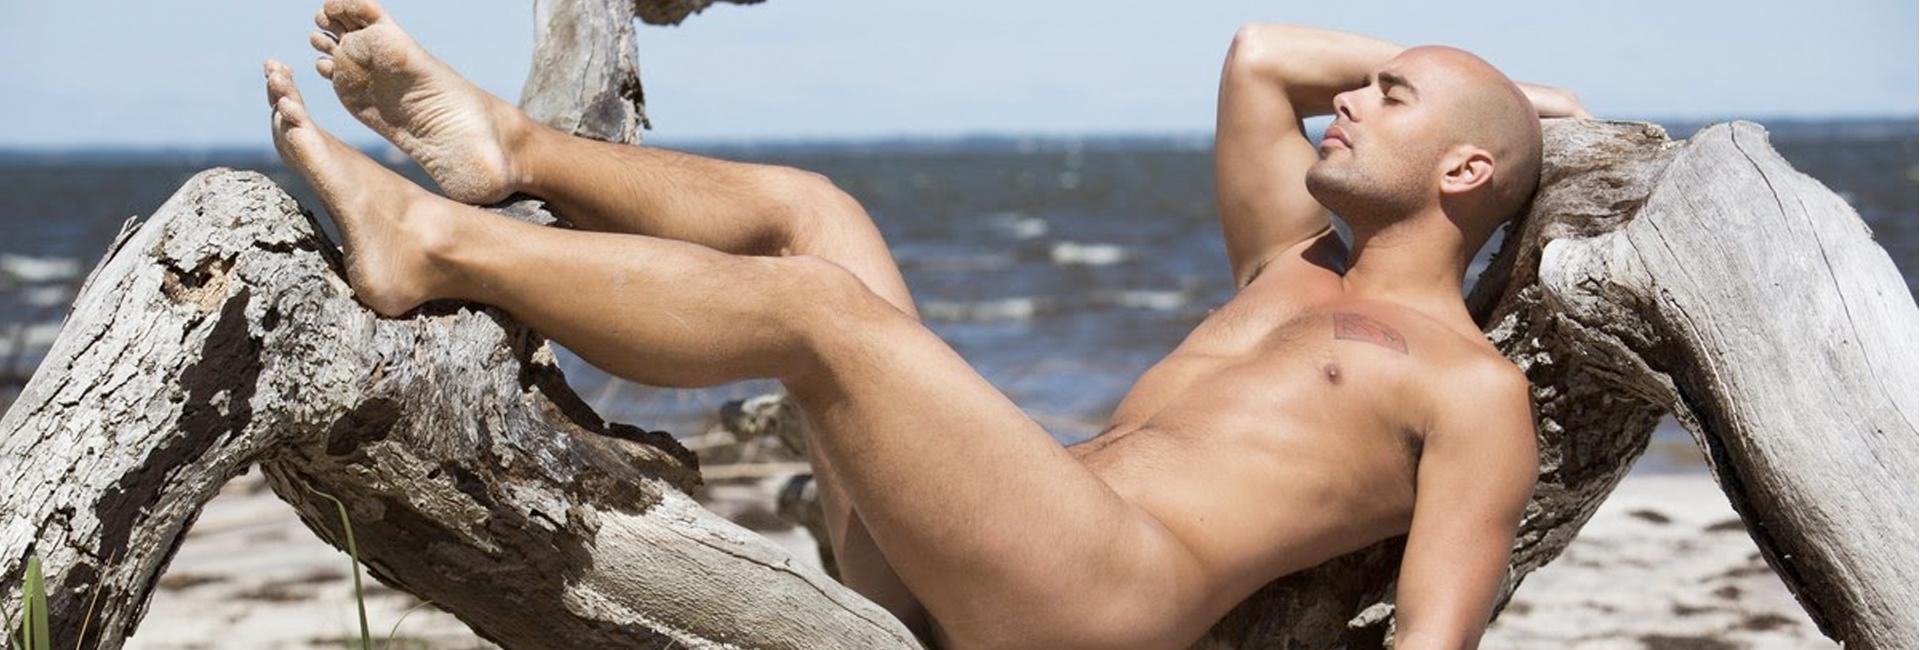 homme-naturiste-bronzage-blog-beaute-soin-parfum-homme